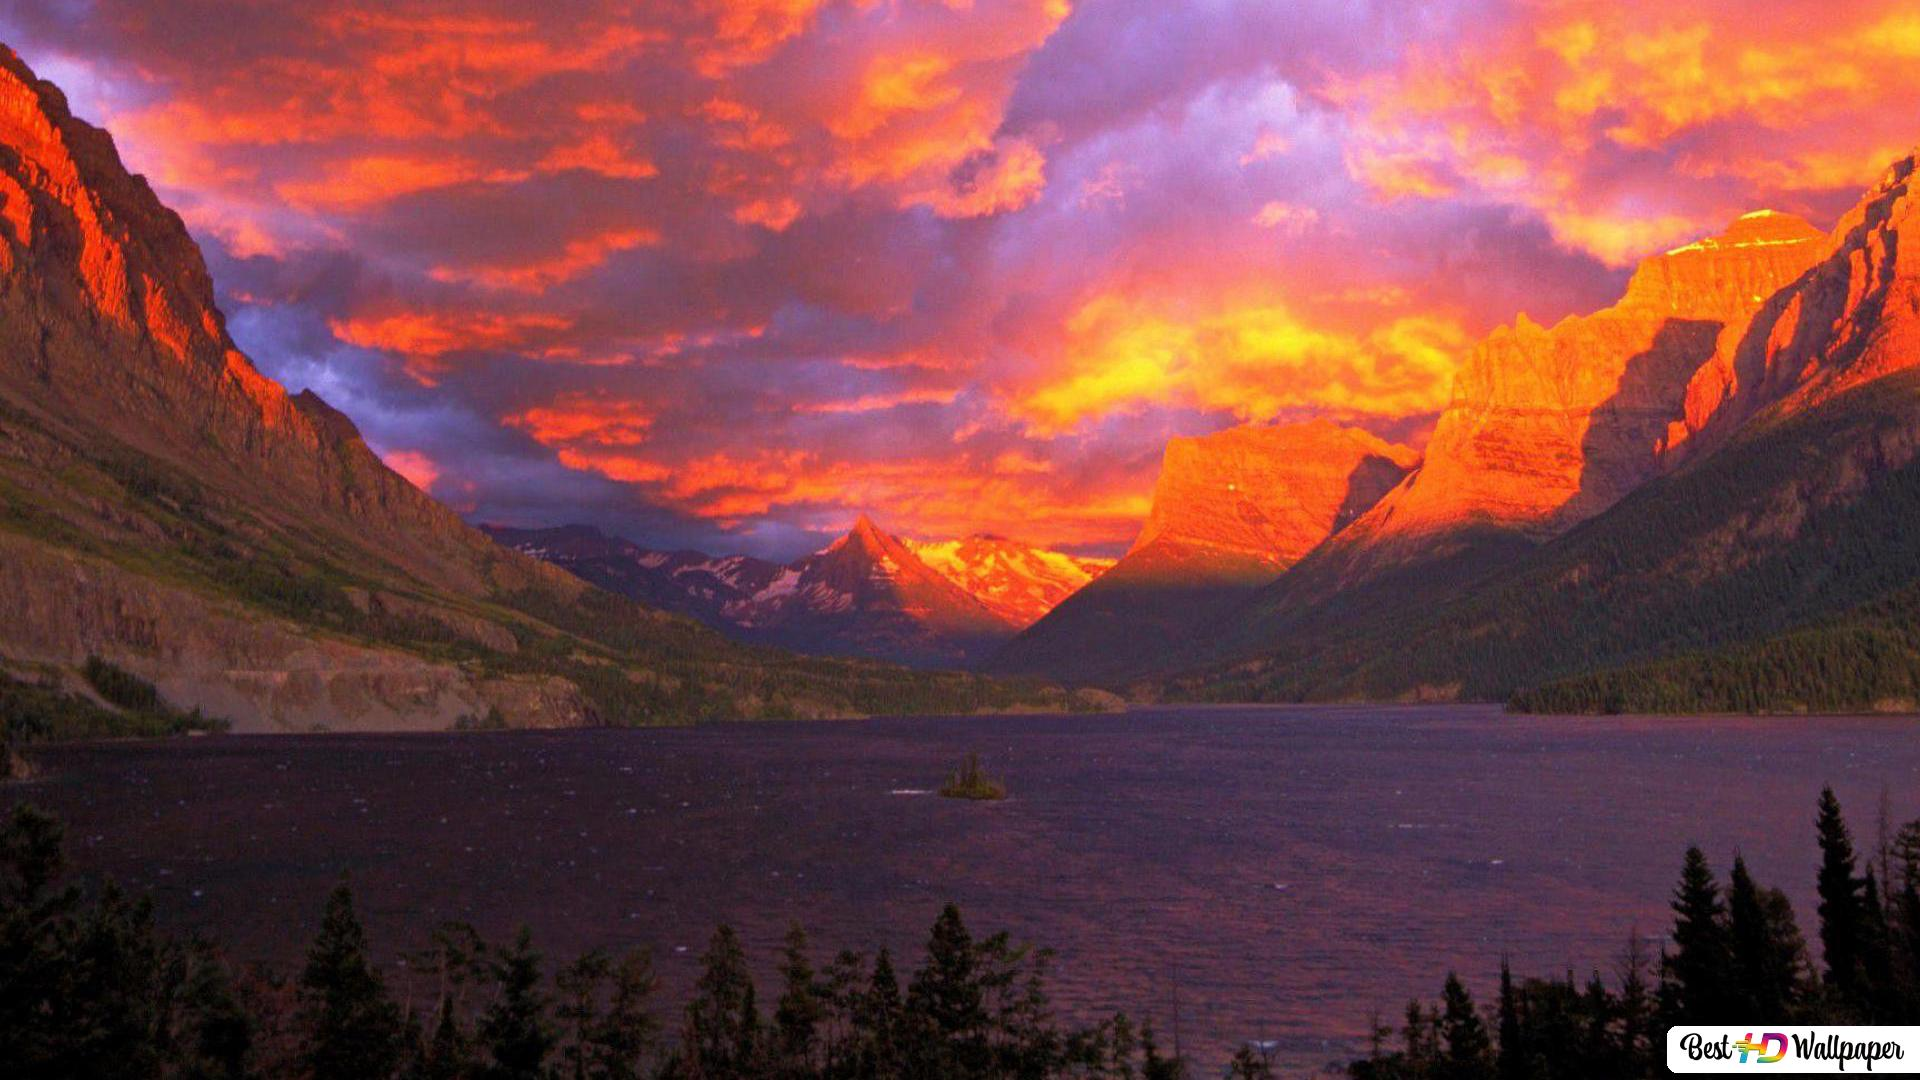 Sunset At Glacier National Park In Alberta Canada Hd Wallpaper